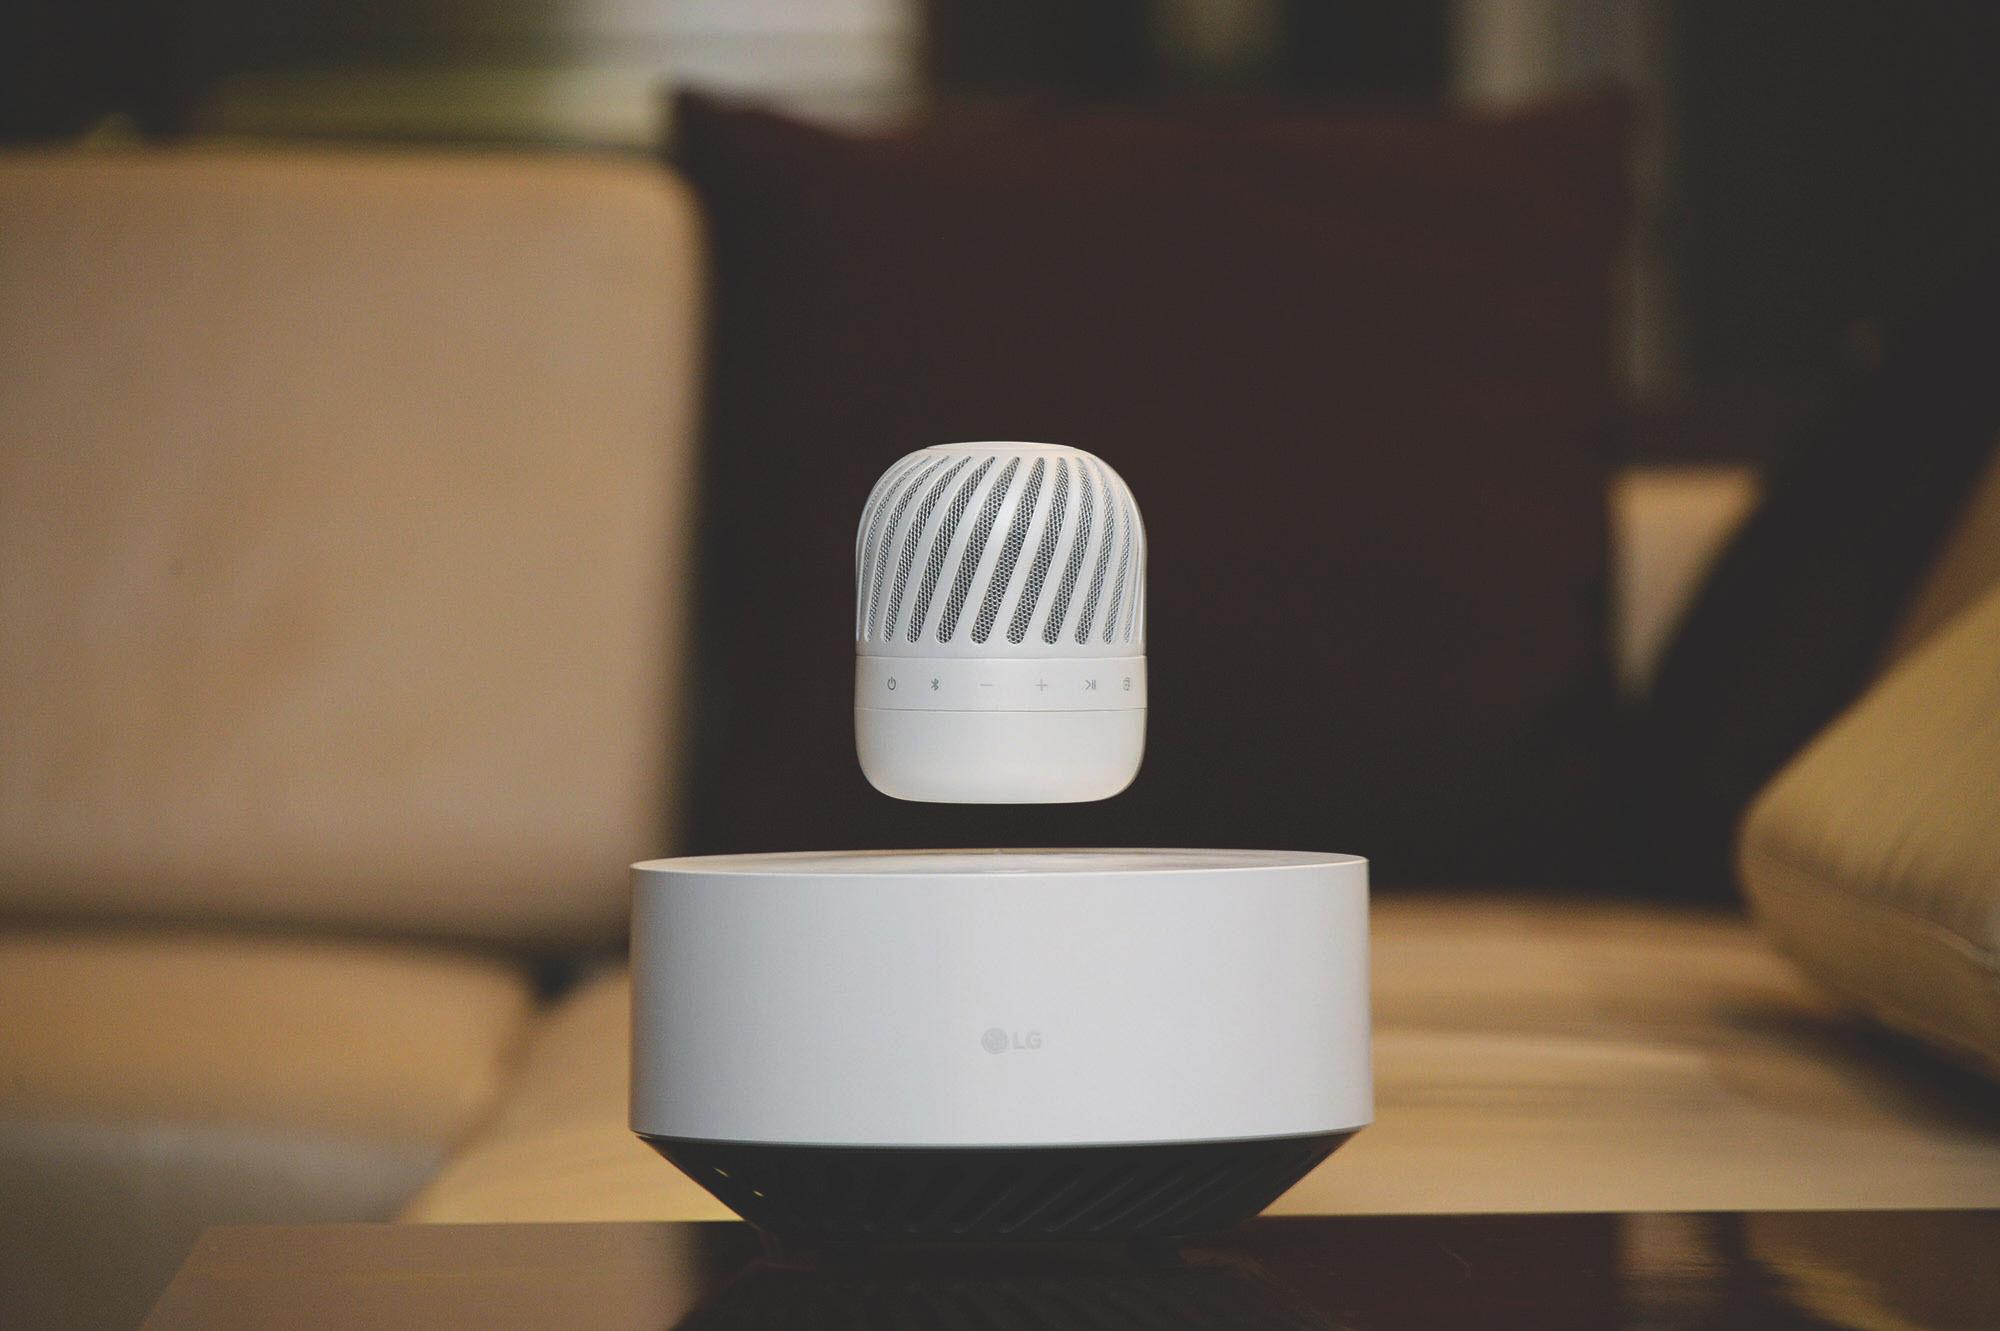 lg_levitating_portable_speaker_blurred-culture